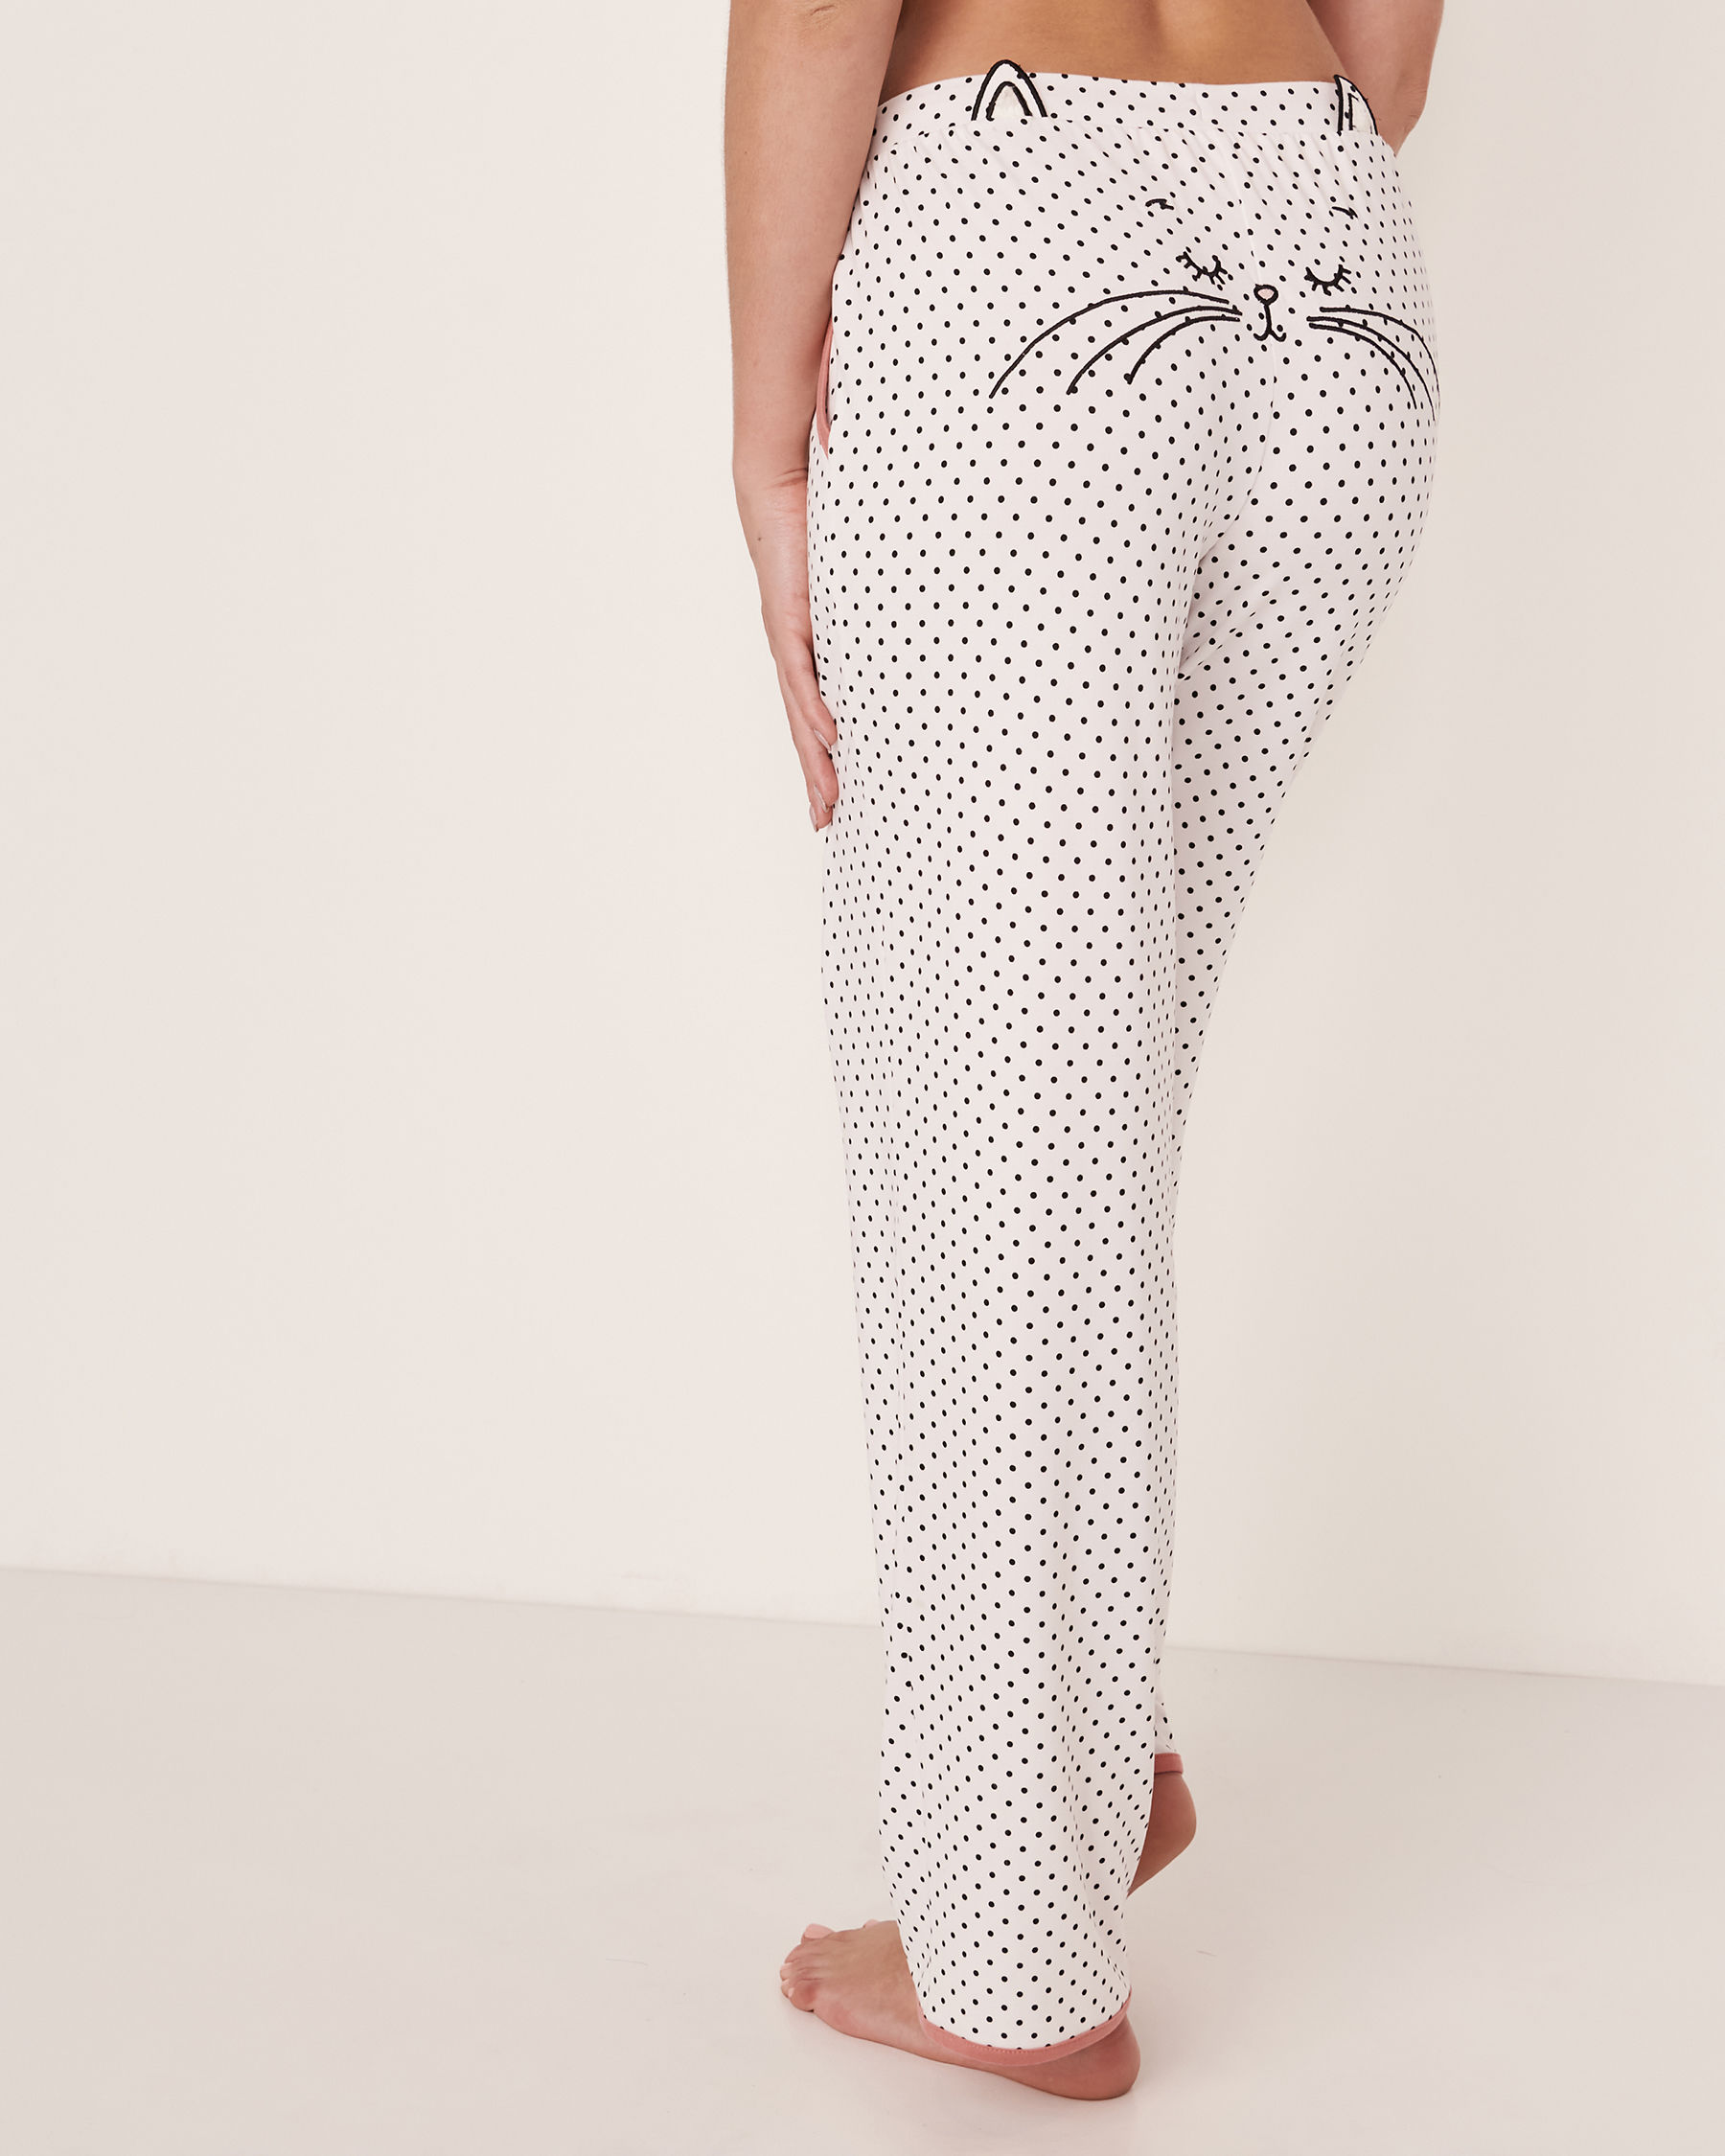 LA VIE EN ROSE 3D Cat Pyjama Pant Black dot 40200083 - View4